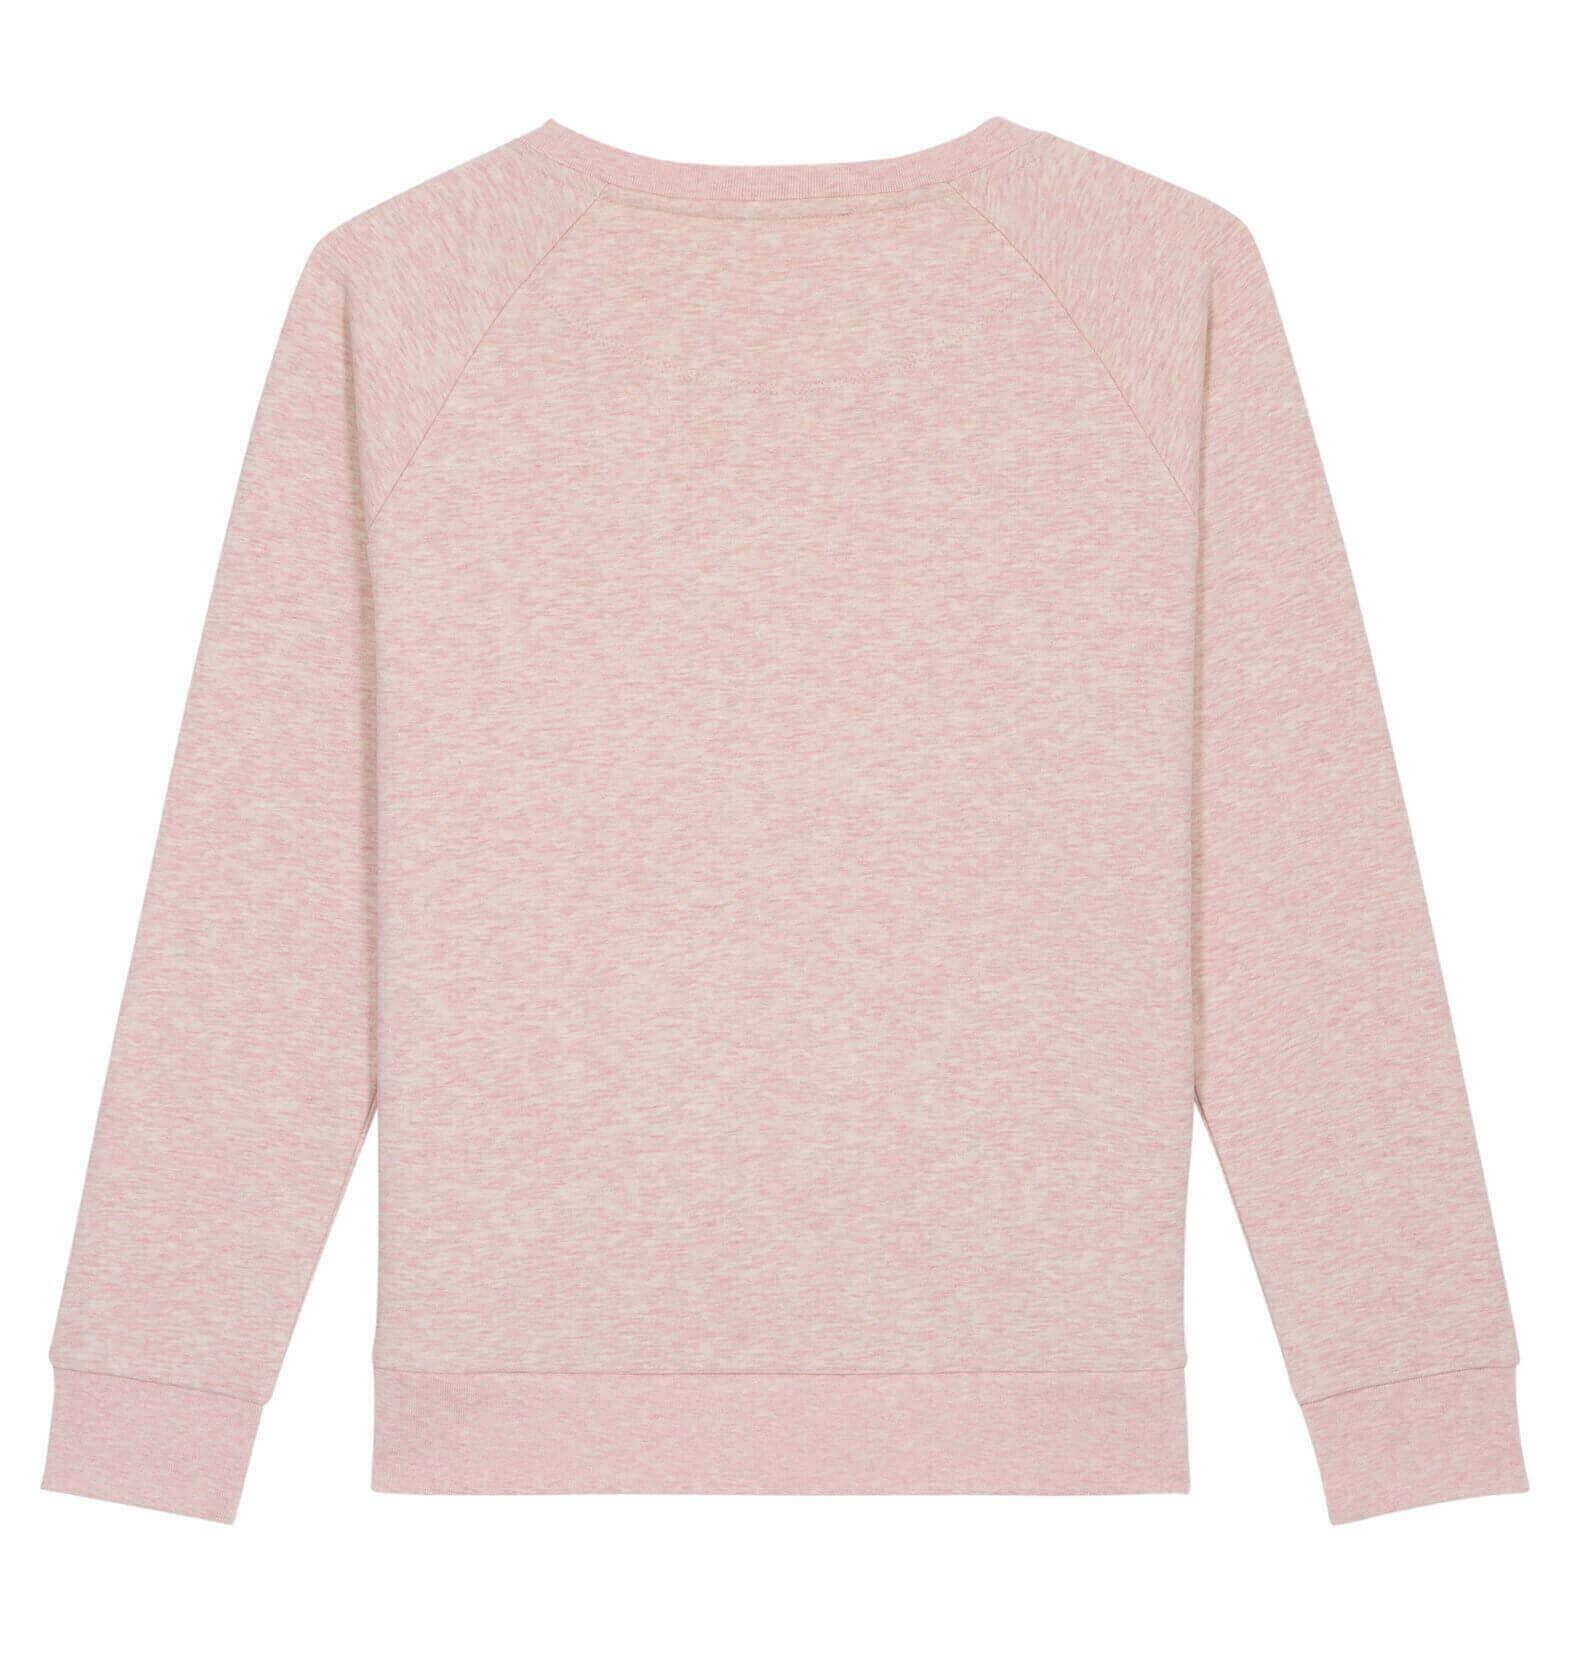 Womens Sweatshirt : No Little Piggies To Market